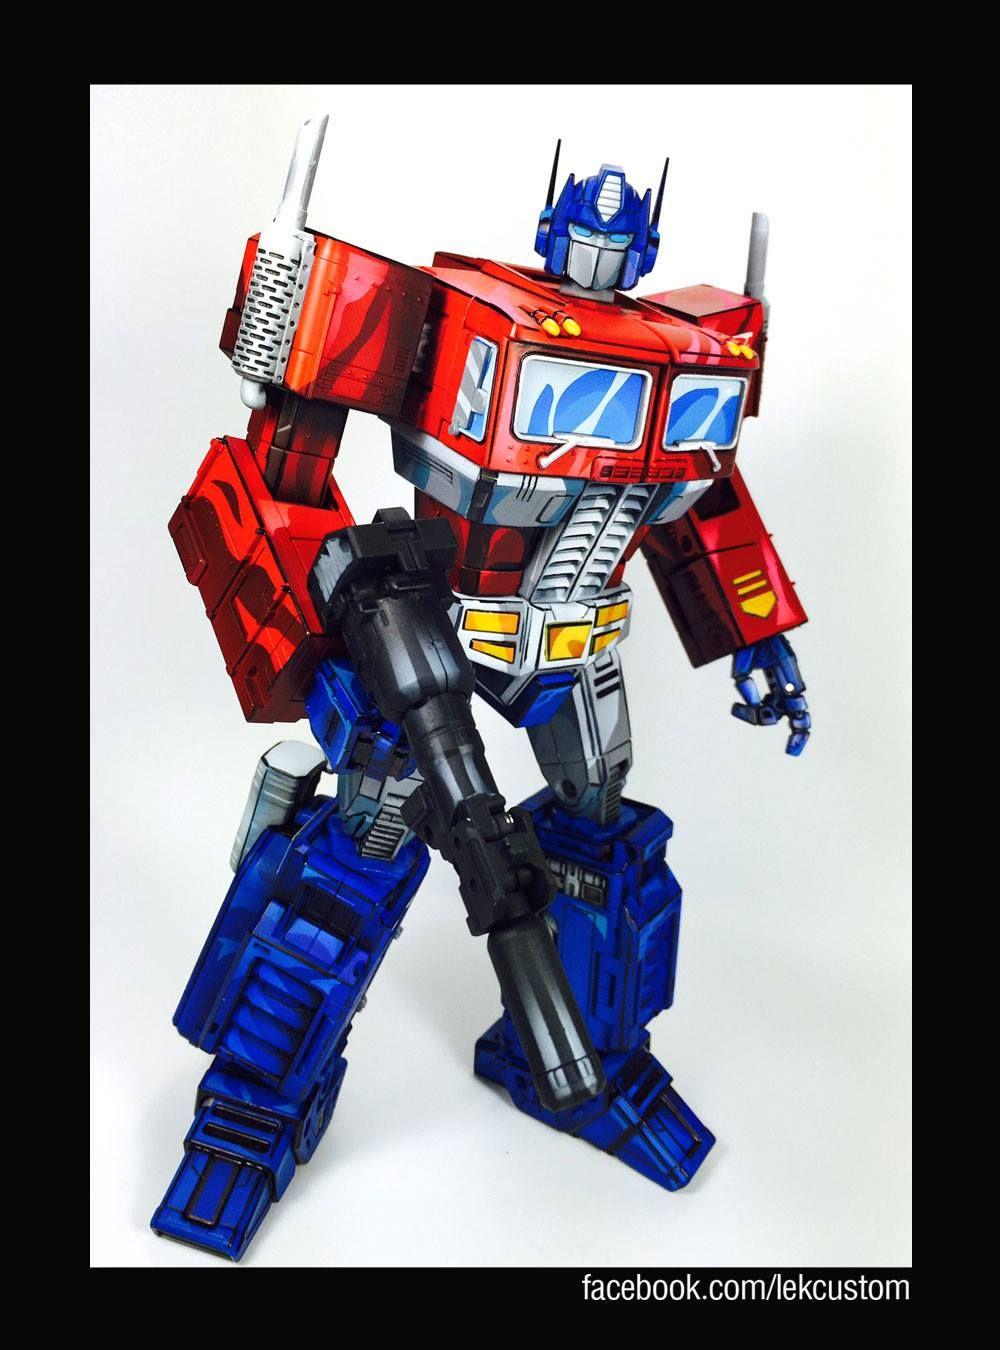 Gear 4 Geeks Transformers Masterpiece Skywarp Kfc Articule Mains